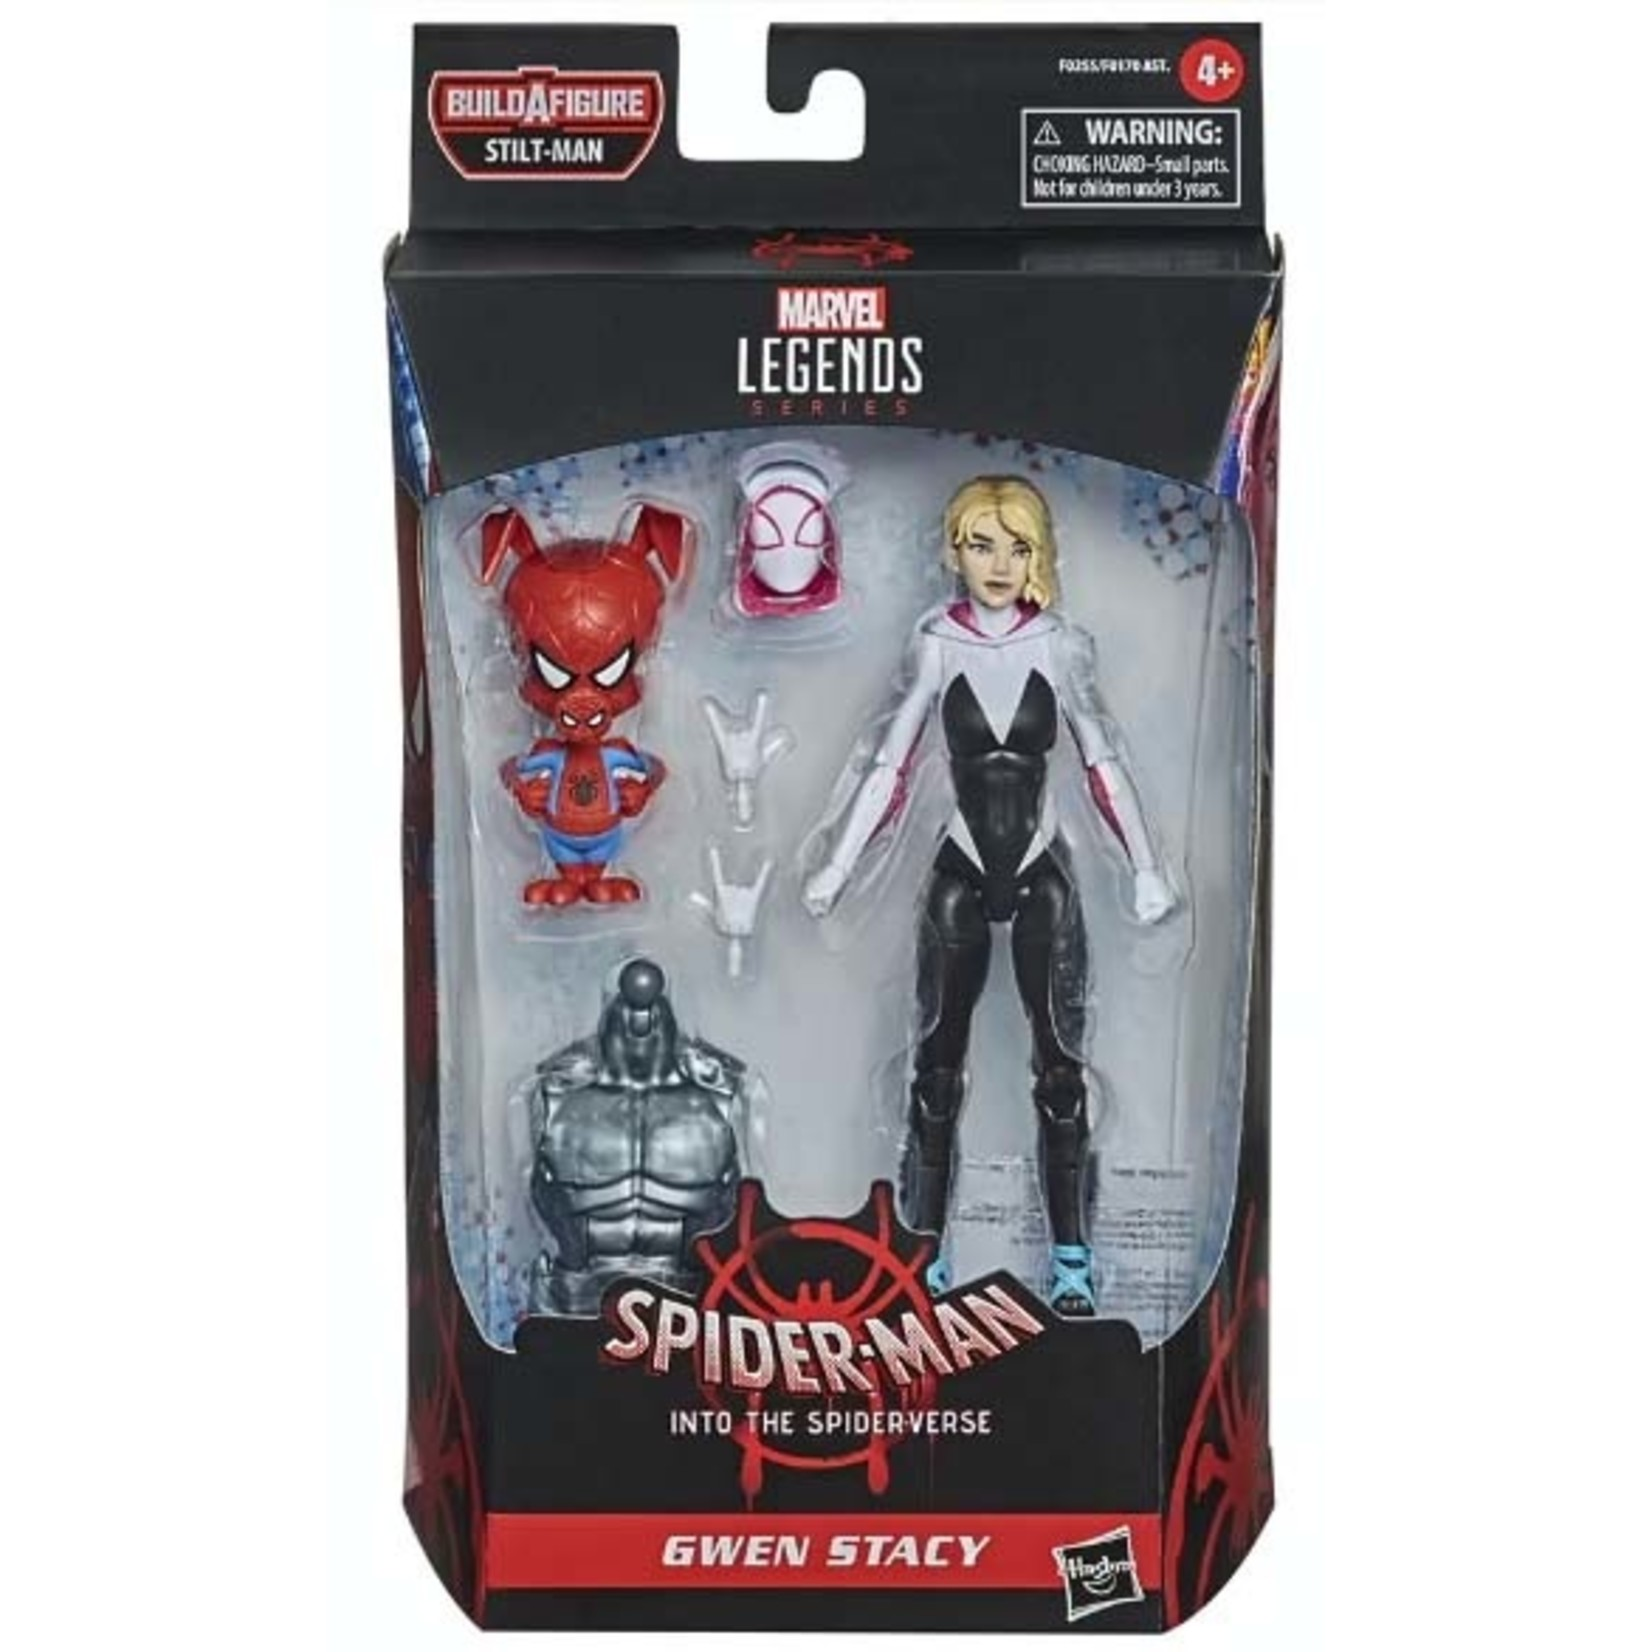 Hasbro Spider-Man: Into the Spider-Verse Marvel Legends Gwen Stacy (Stilt-Man BAF)